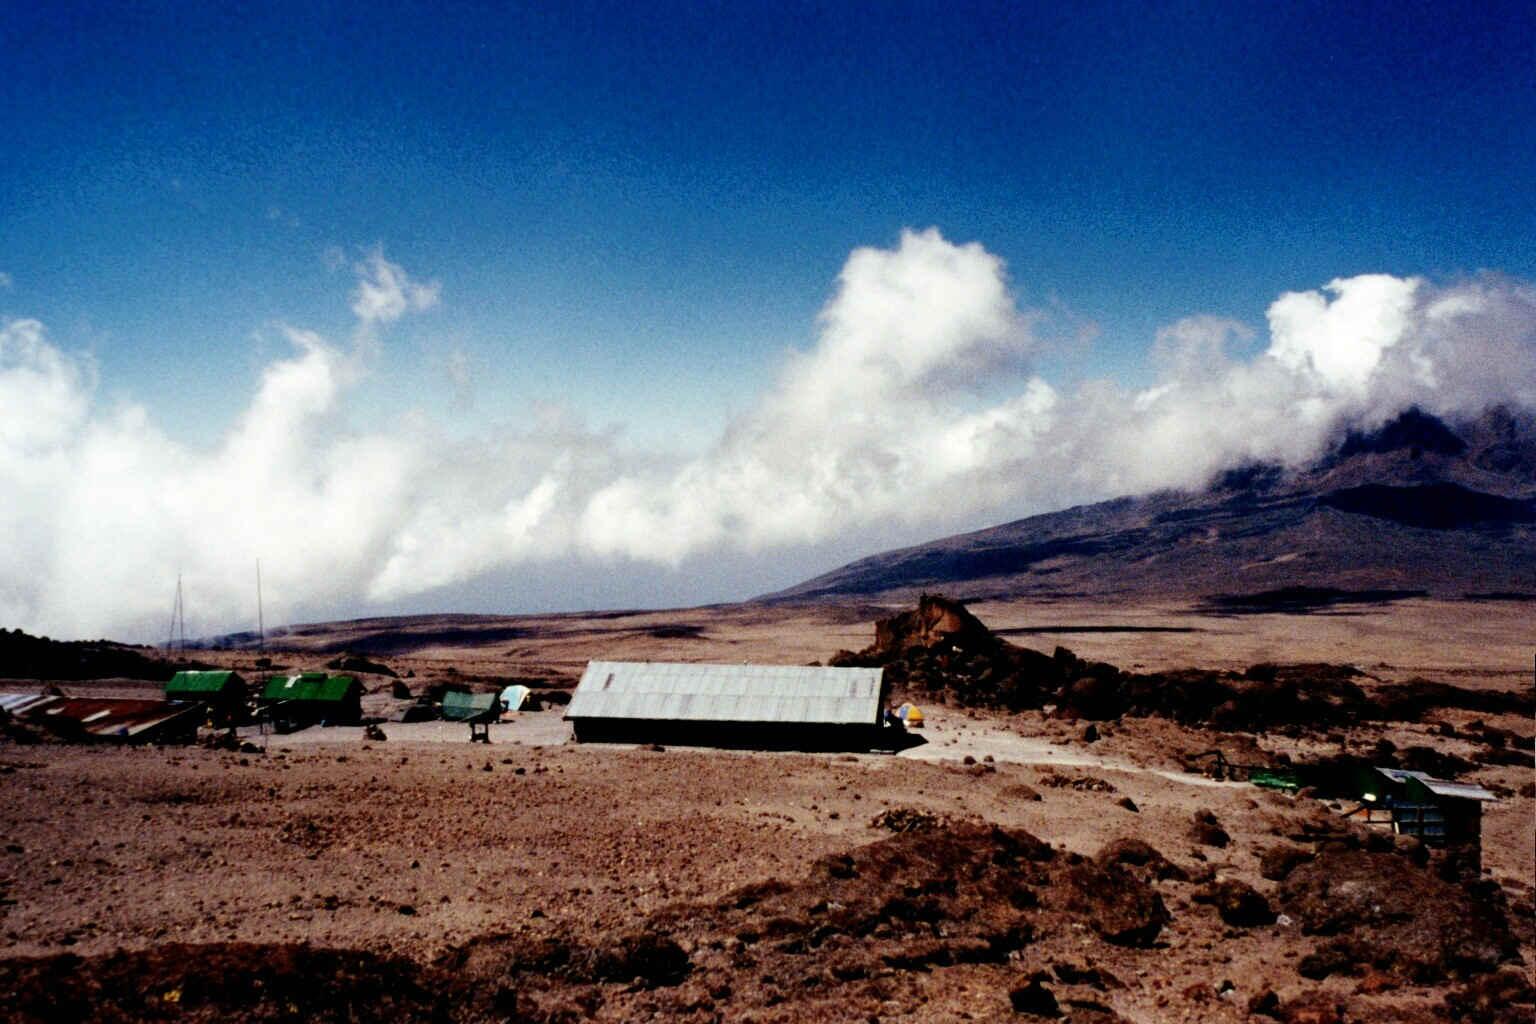 wp-content/uploads/itineraries/Kilimanjaro/kili-rongai-kibo-camp.jpg